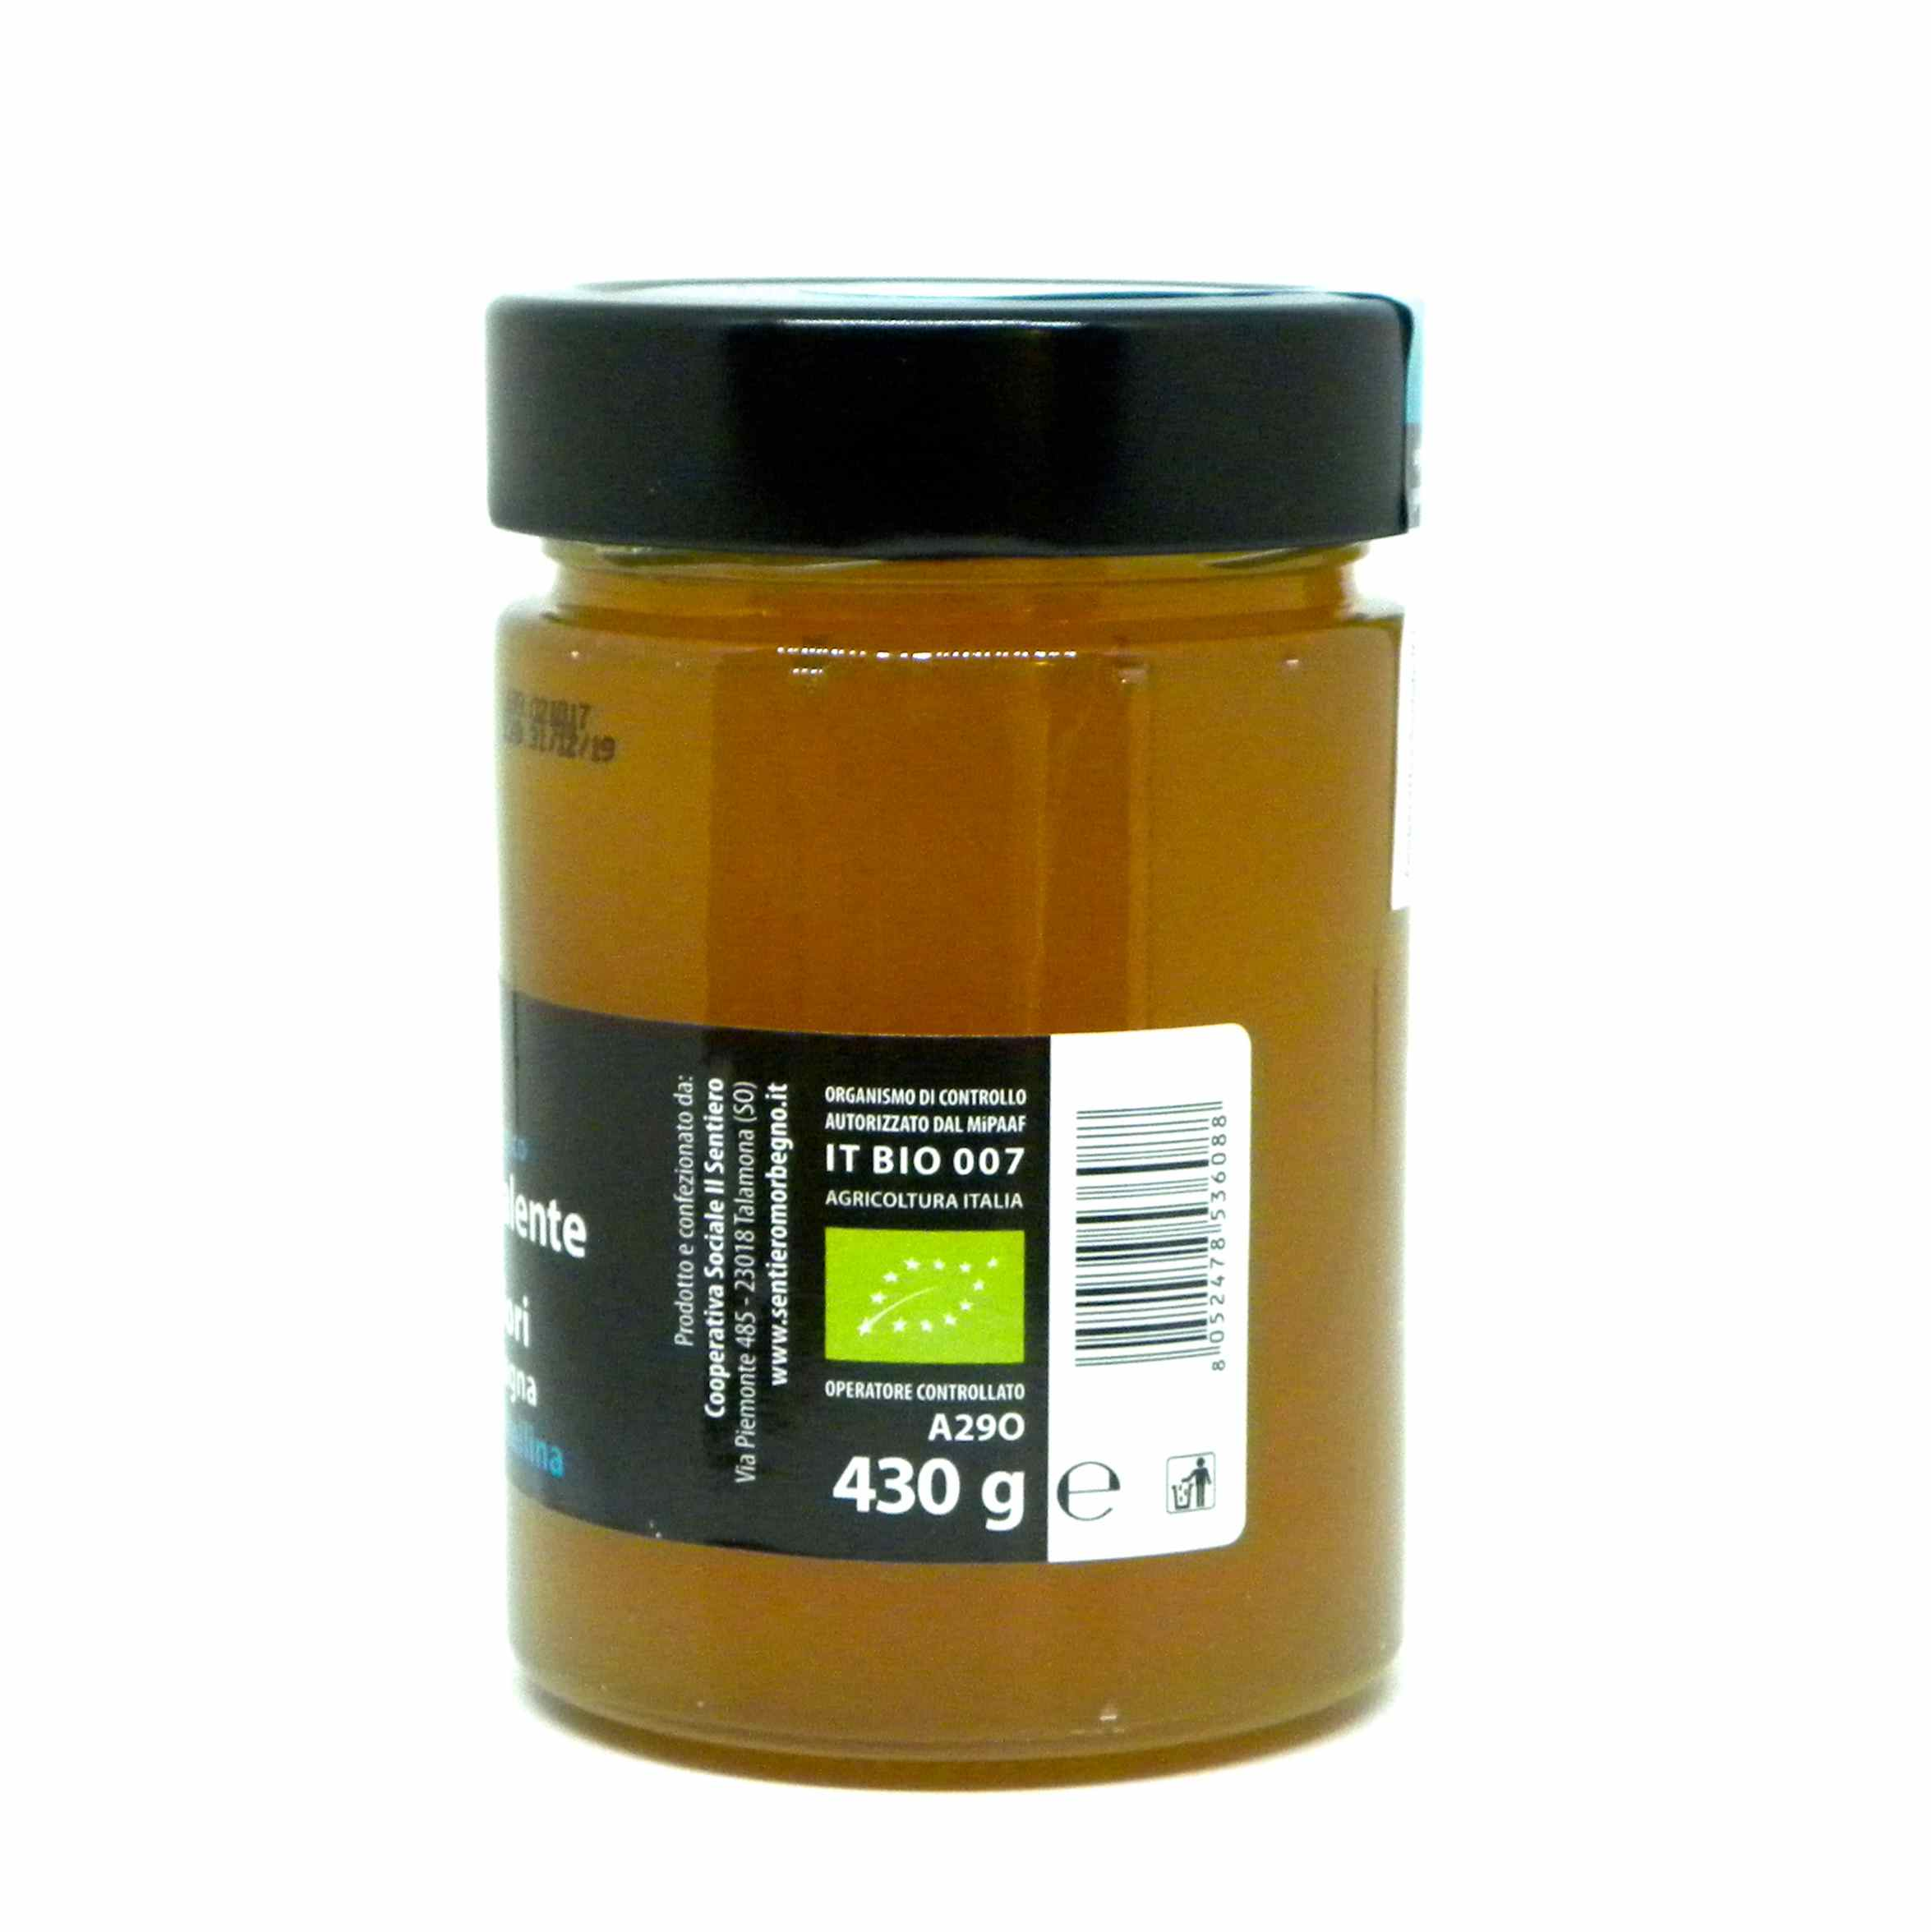 Festinalente miele bio millefiori Valtellina – Festinalente organic raw thousand flowers honey – Gustorotondo – Italian food boutique